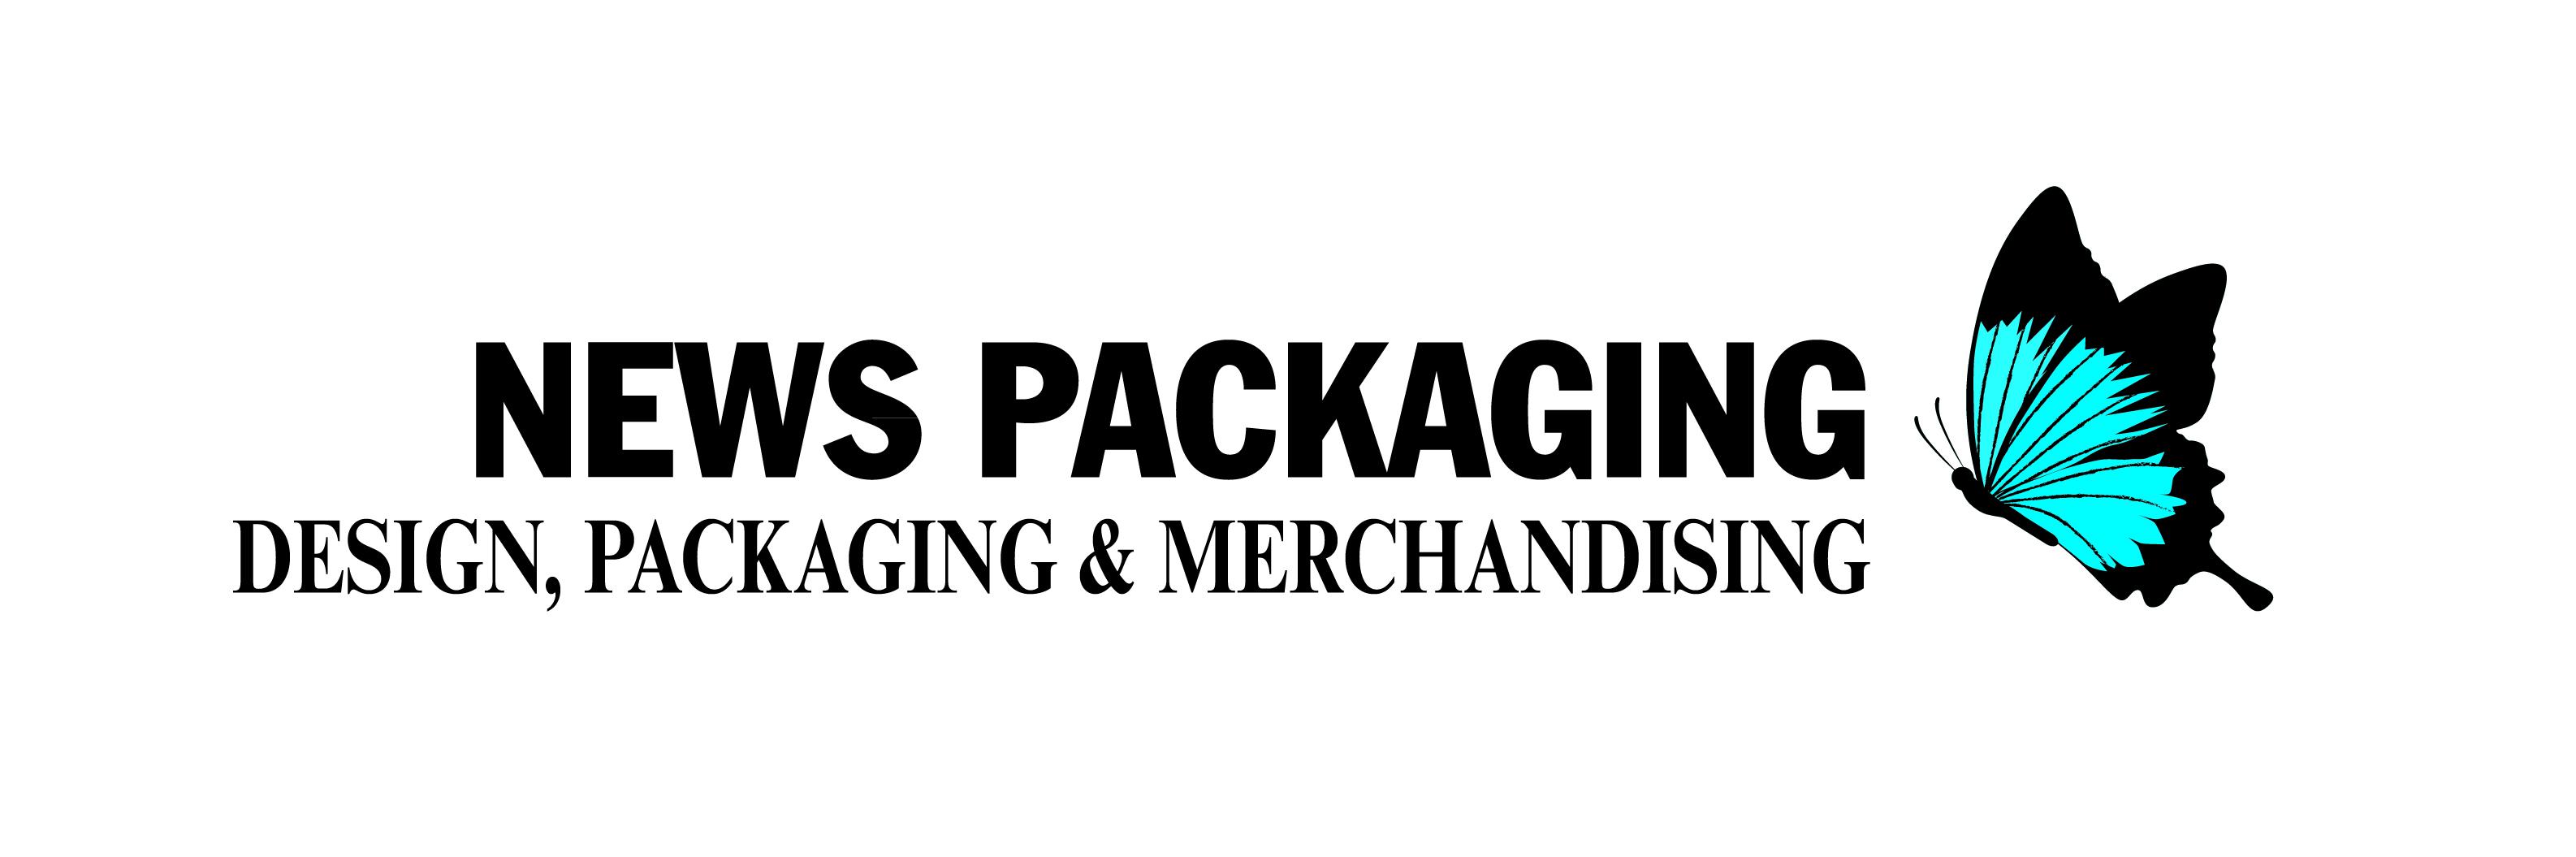 https://campaign-image.eu/zohocampaigns/16486000007494047_zc_v24_logo_news_packging.jpg